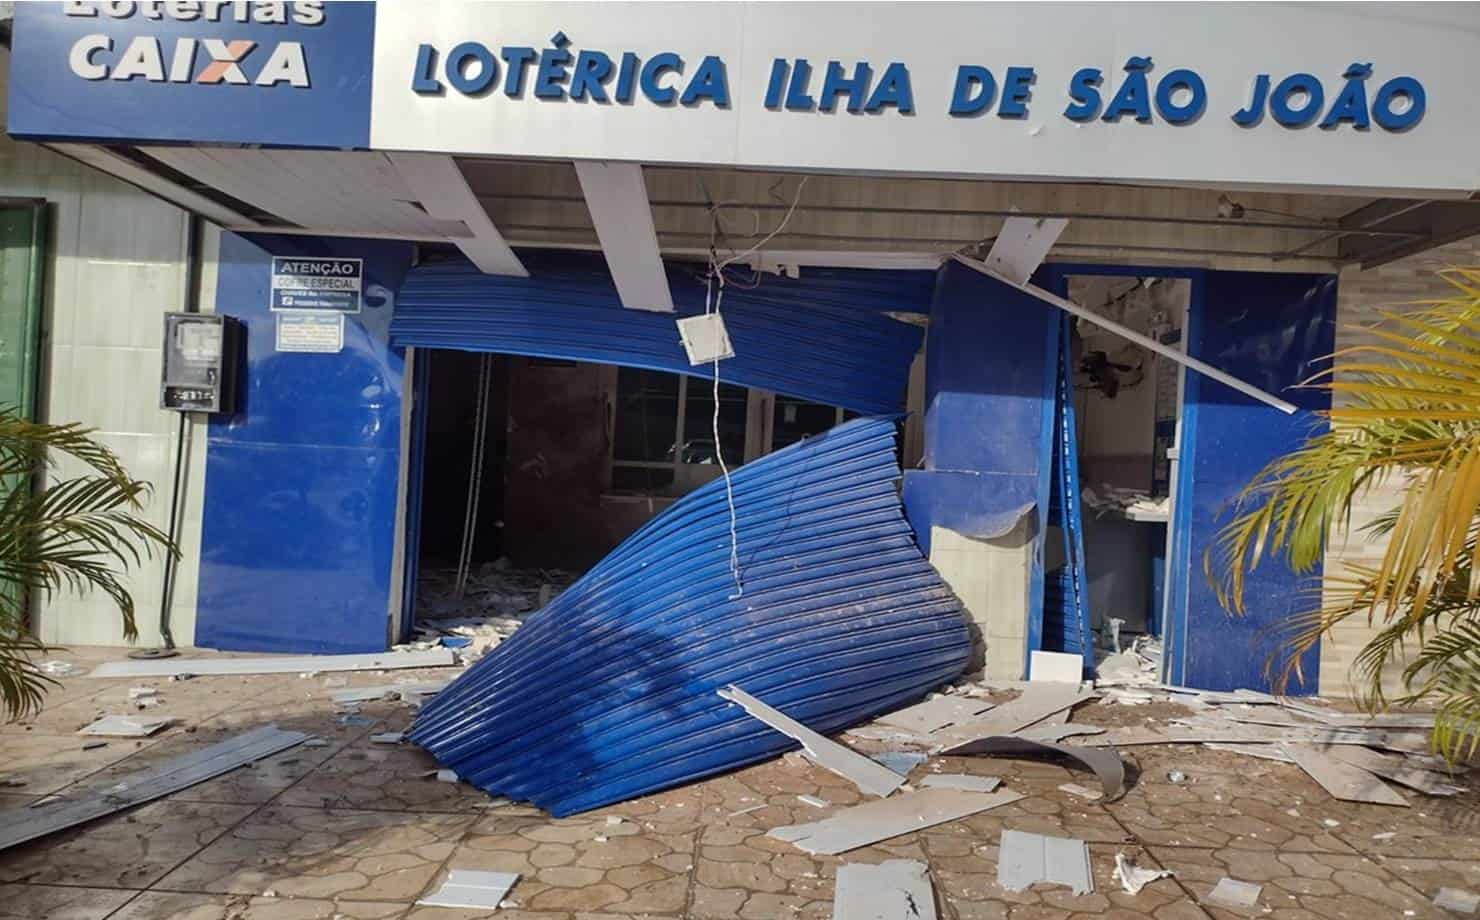 Casa Lotérica Explodida